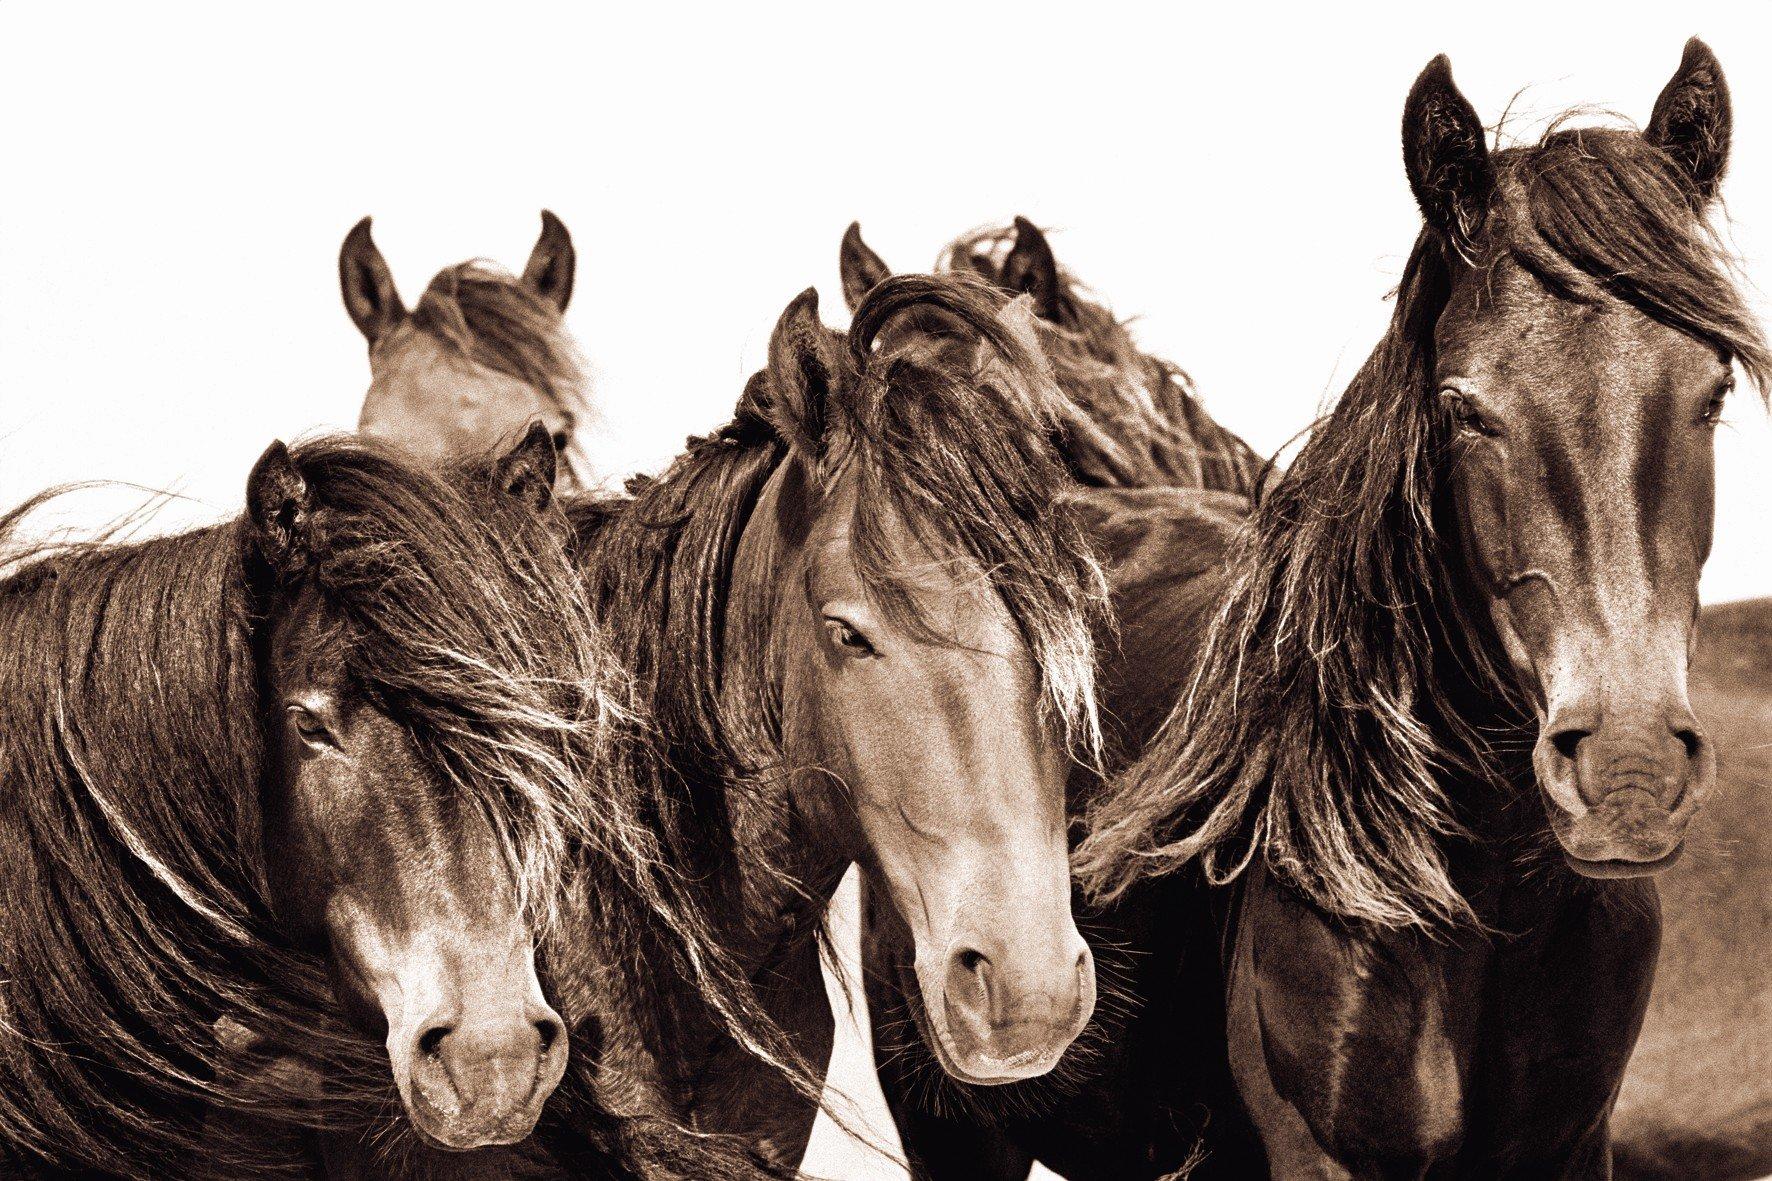 The Wild Horses of Sable Island Roberto Dutesco